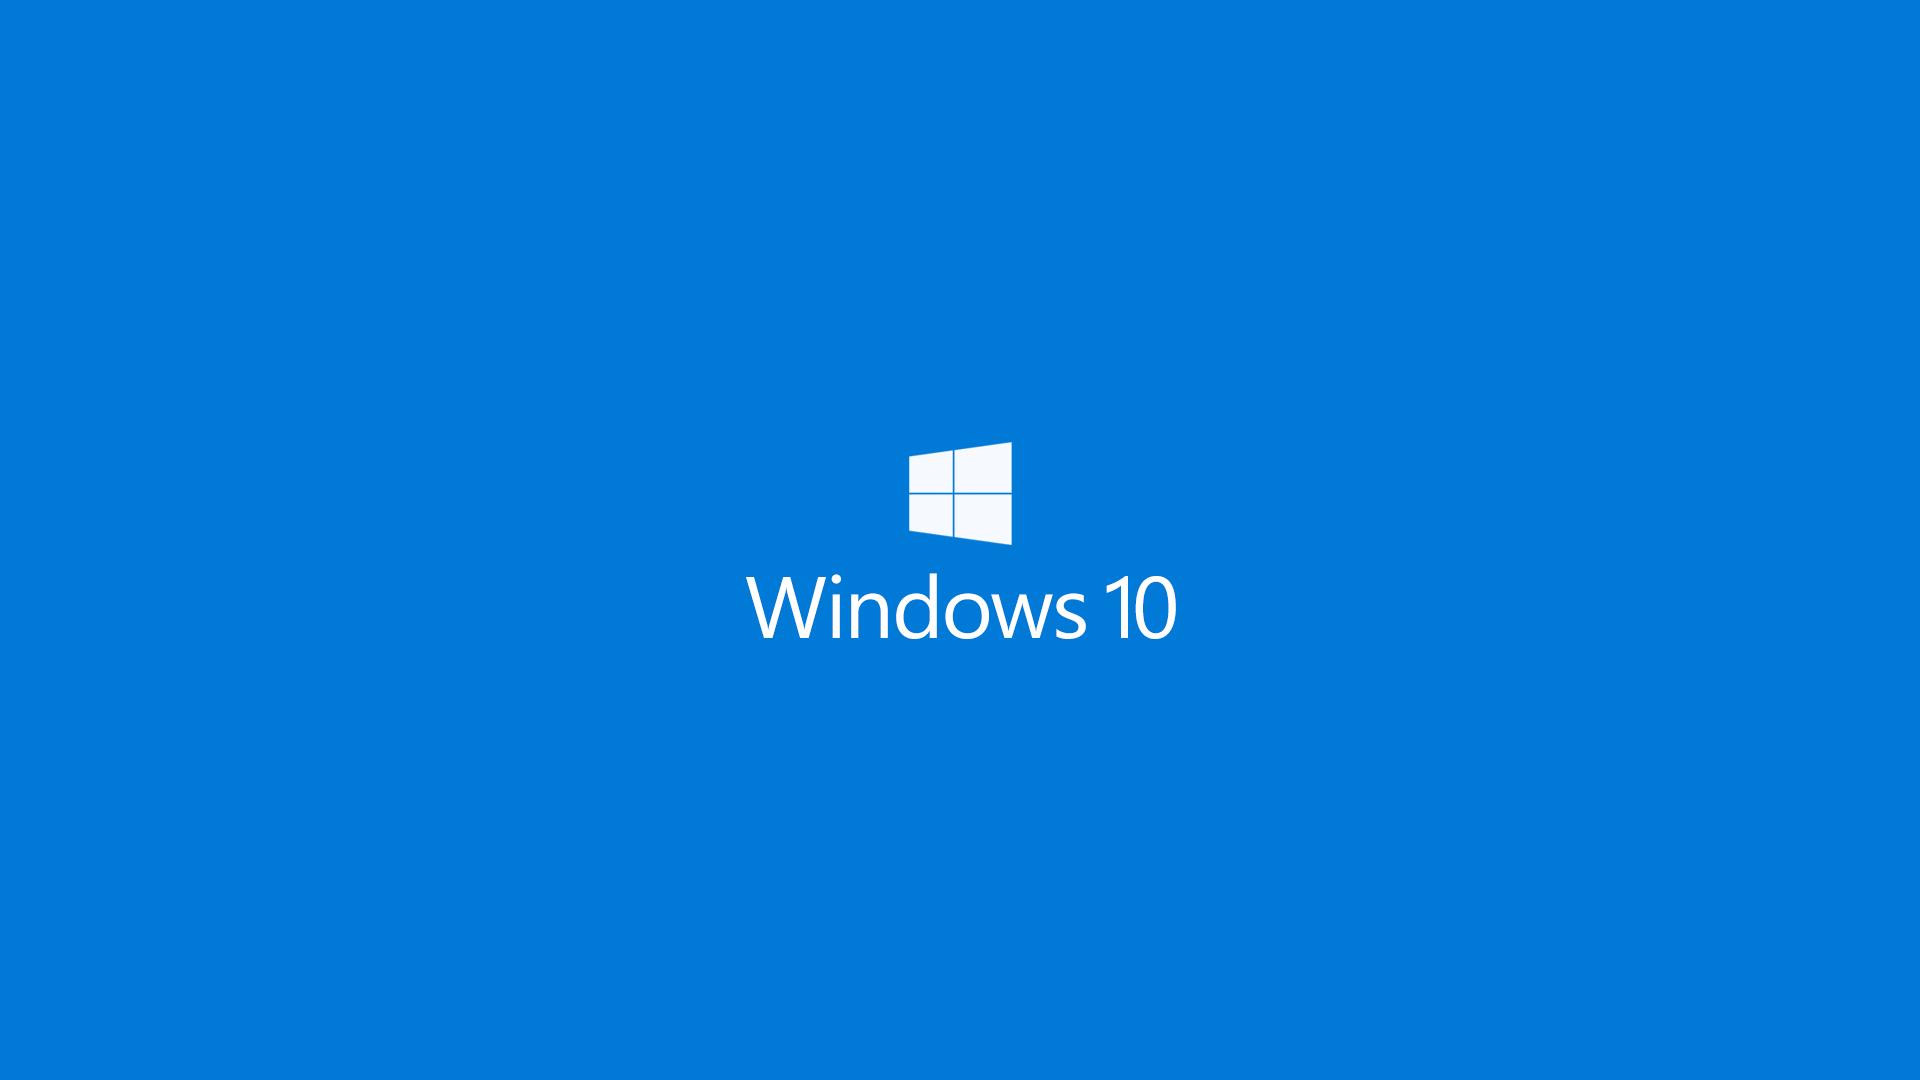 windows-10-blue-background-desktop-background